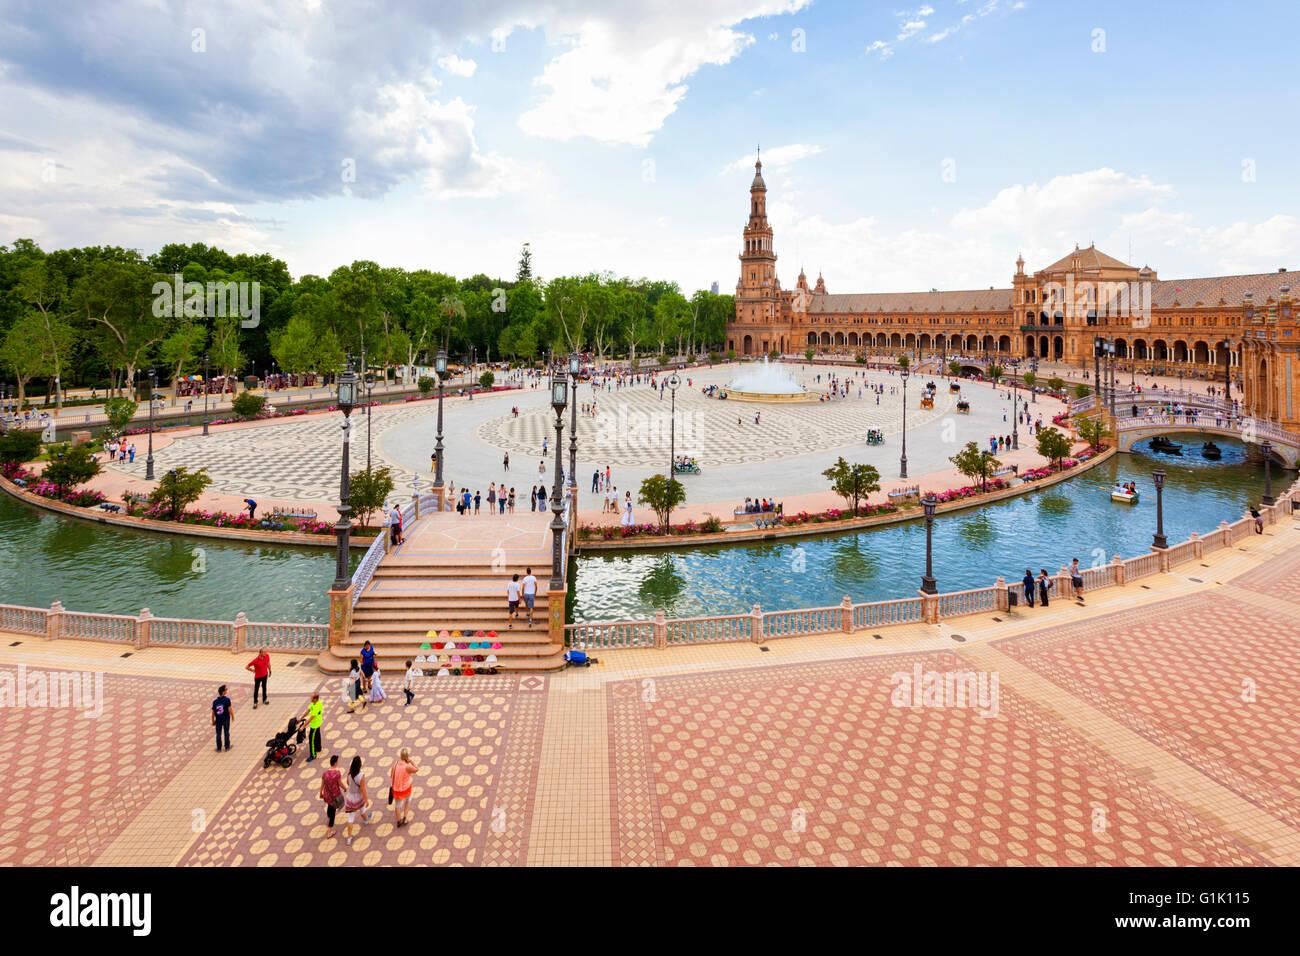 Wide angle view of Plaza de España, Seville, Spain - Stock Image